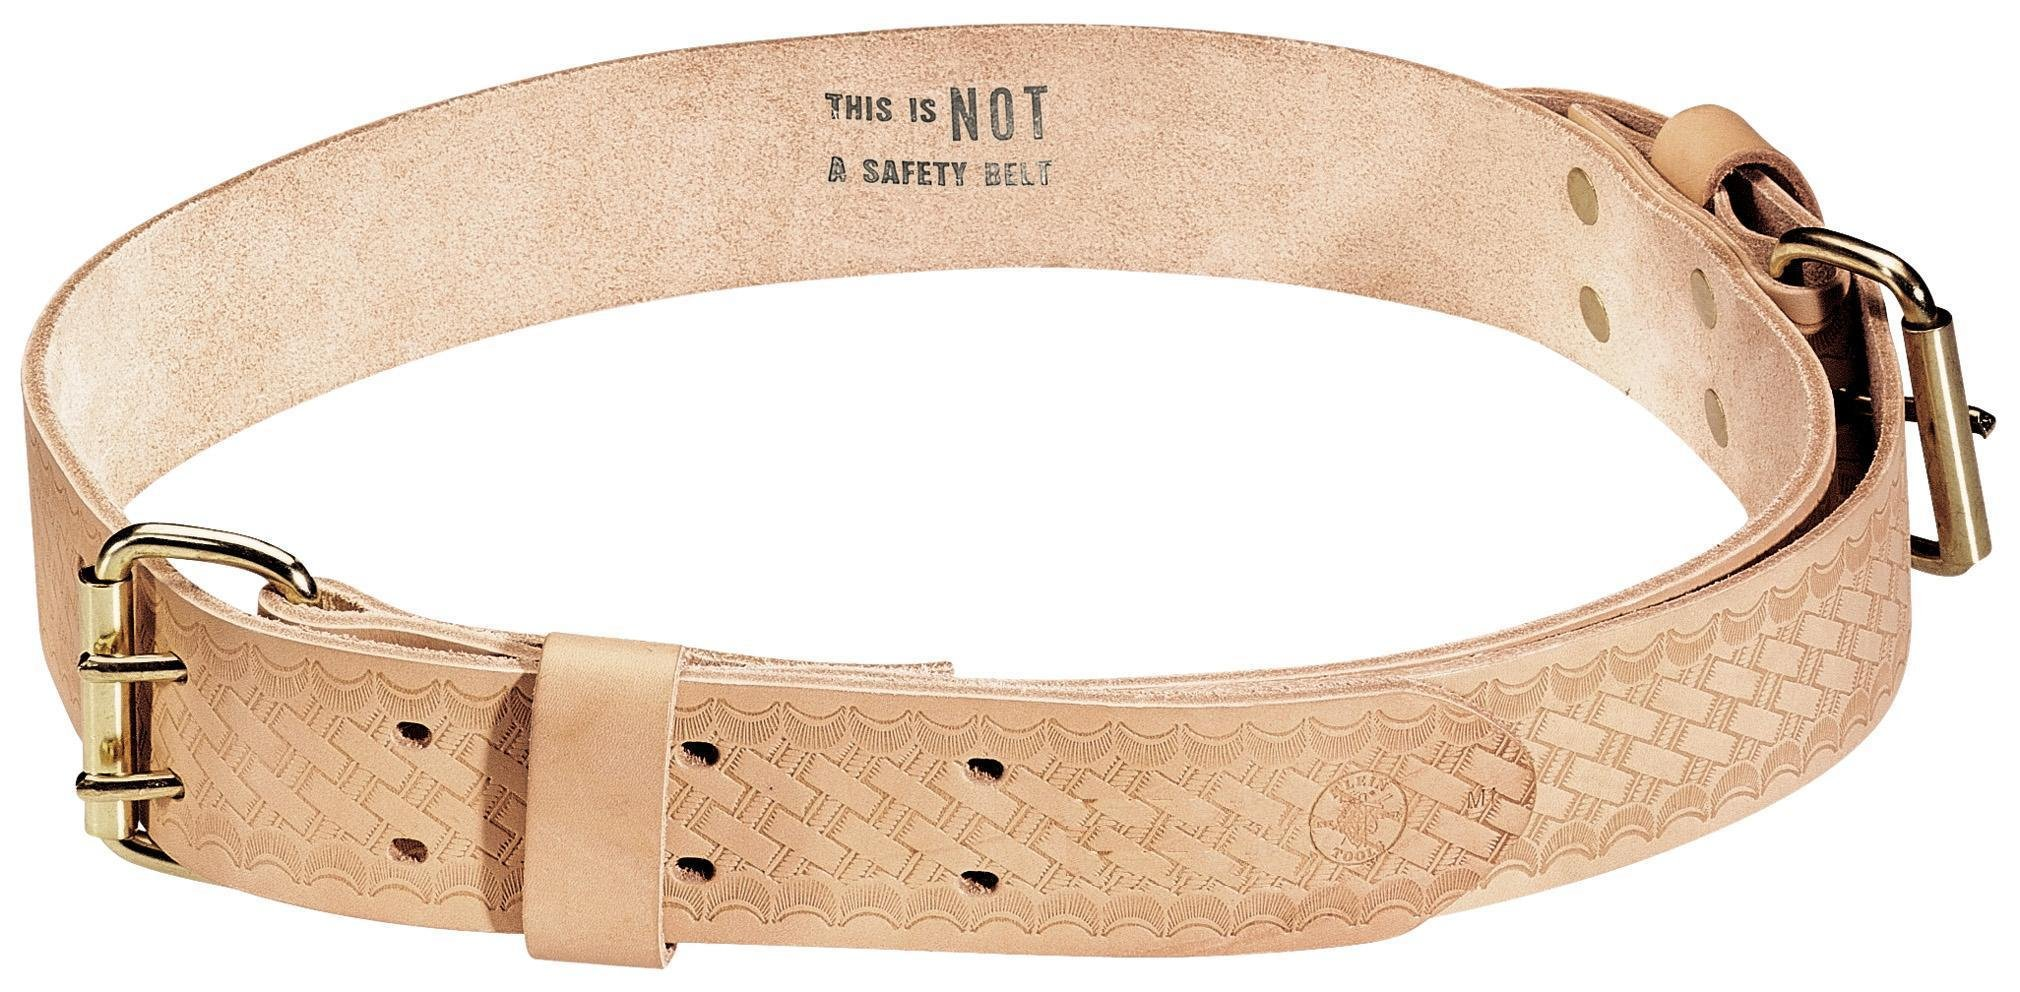 Ironworker's Heavy-Duty Tie-Wire Belt, Large Klein Tools 5420L